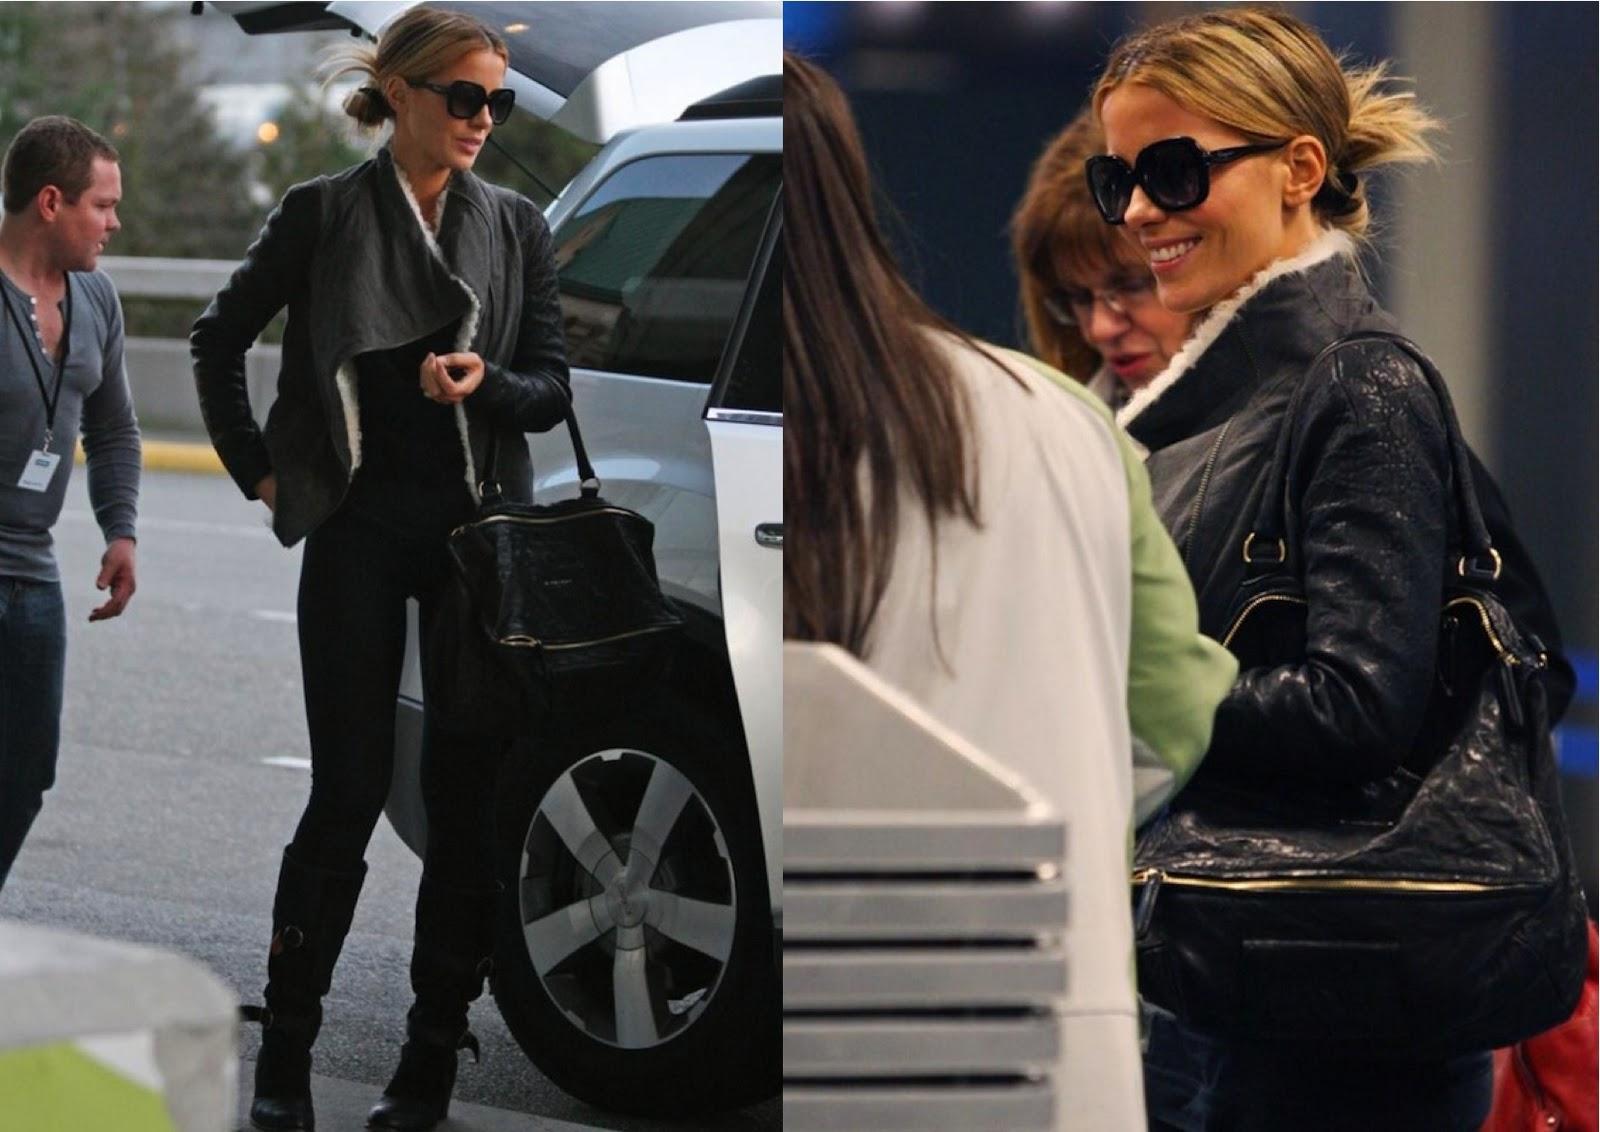 http://4.bp.blogspot.com/_PfmV3qvy8FY/TUMWllv3d-I/AAAAAAAABUo/RGFLheqynRw/s1600/la+modella+mafia+Kate+Beckinsale+in+Helmut+Lang+jacket.jpg